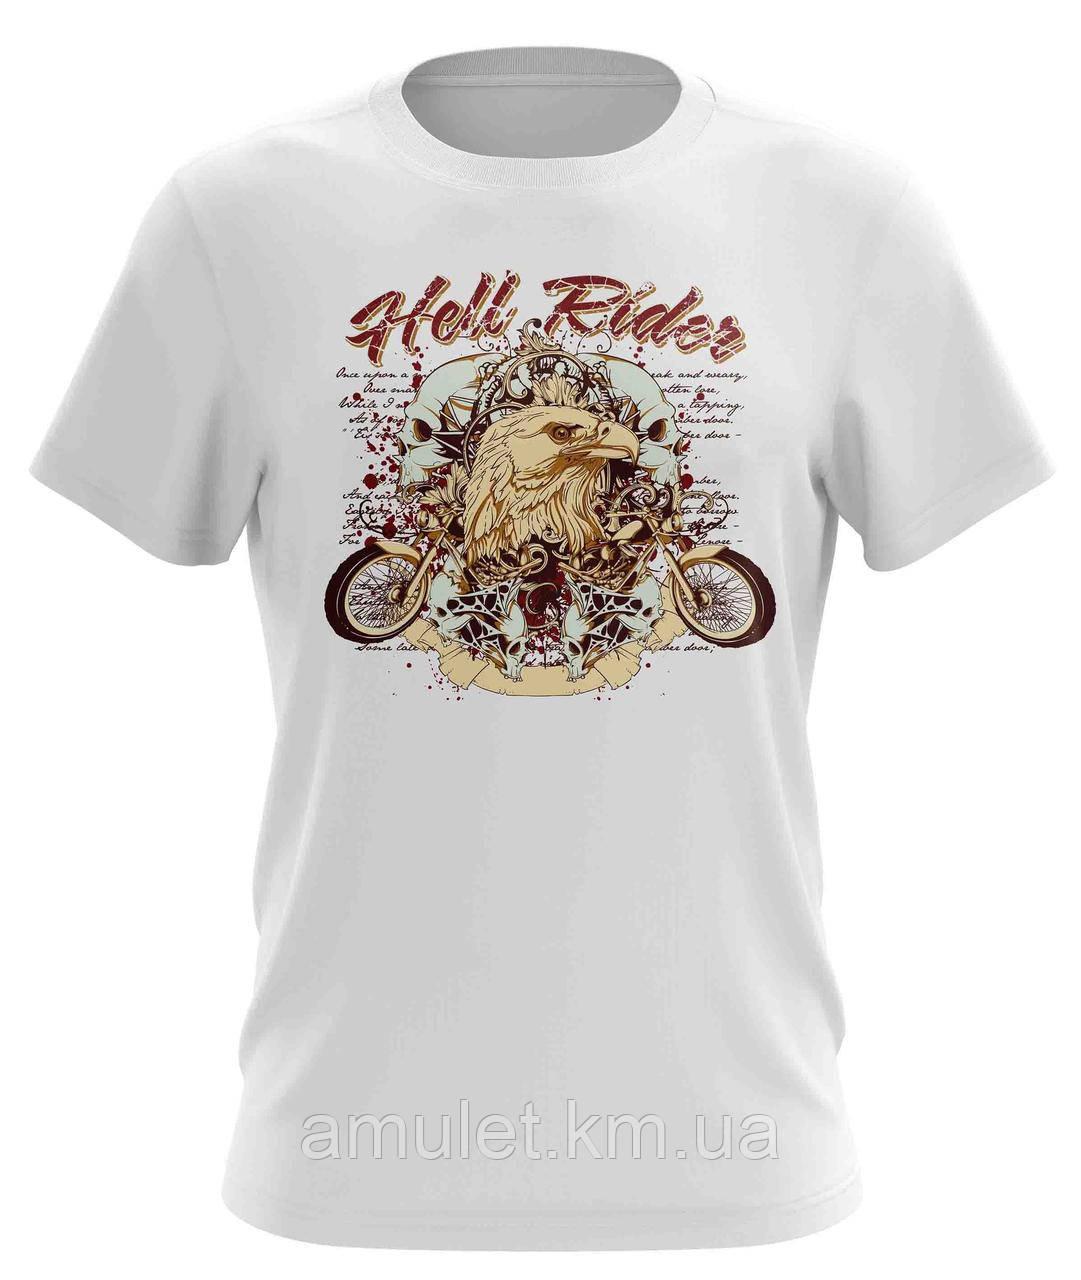 "Футболка для мужчин с рисунком  ""Hell rider"""